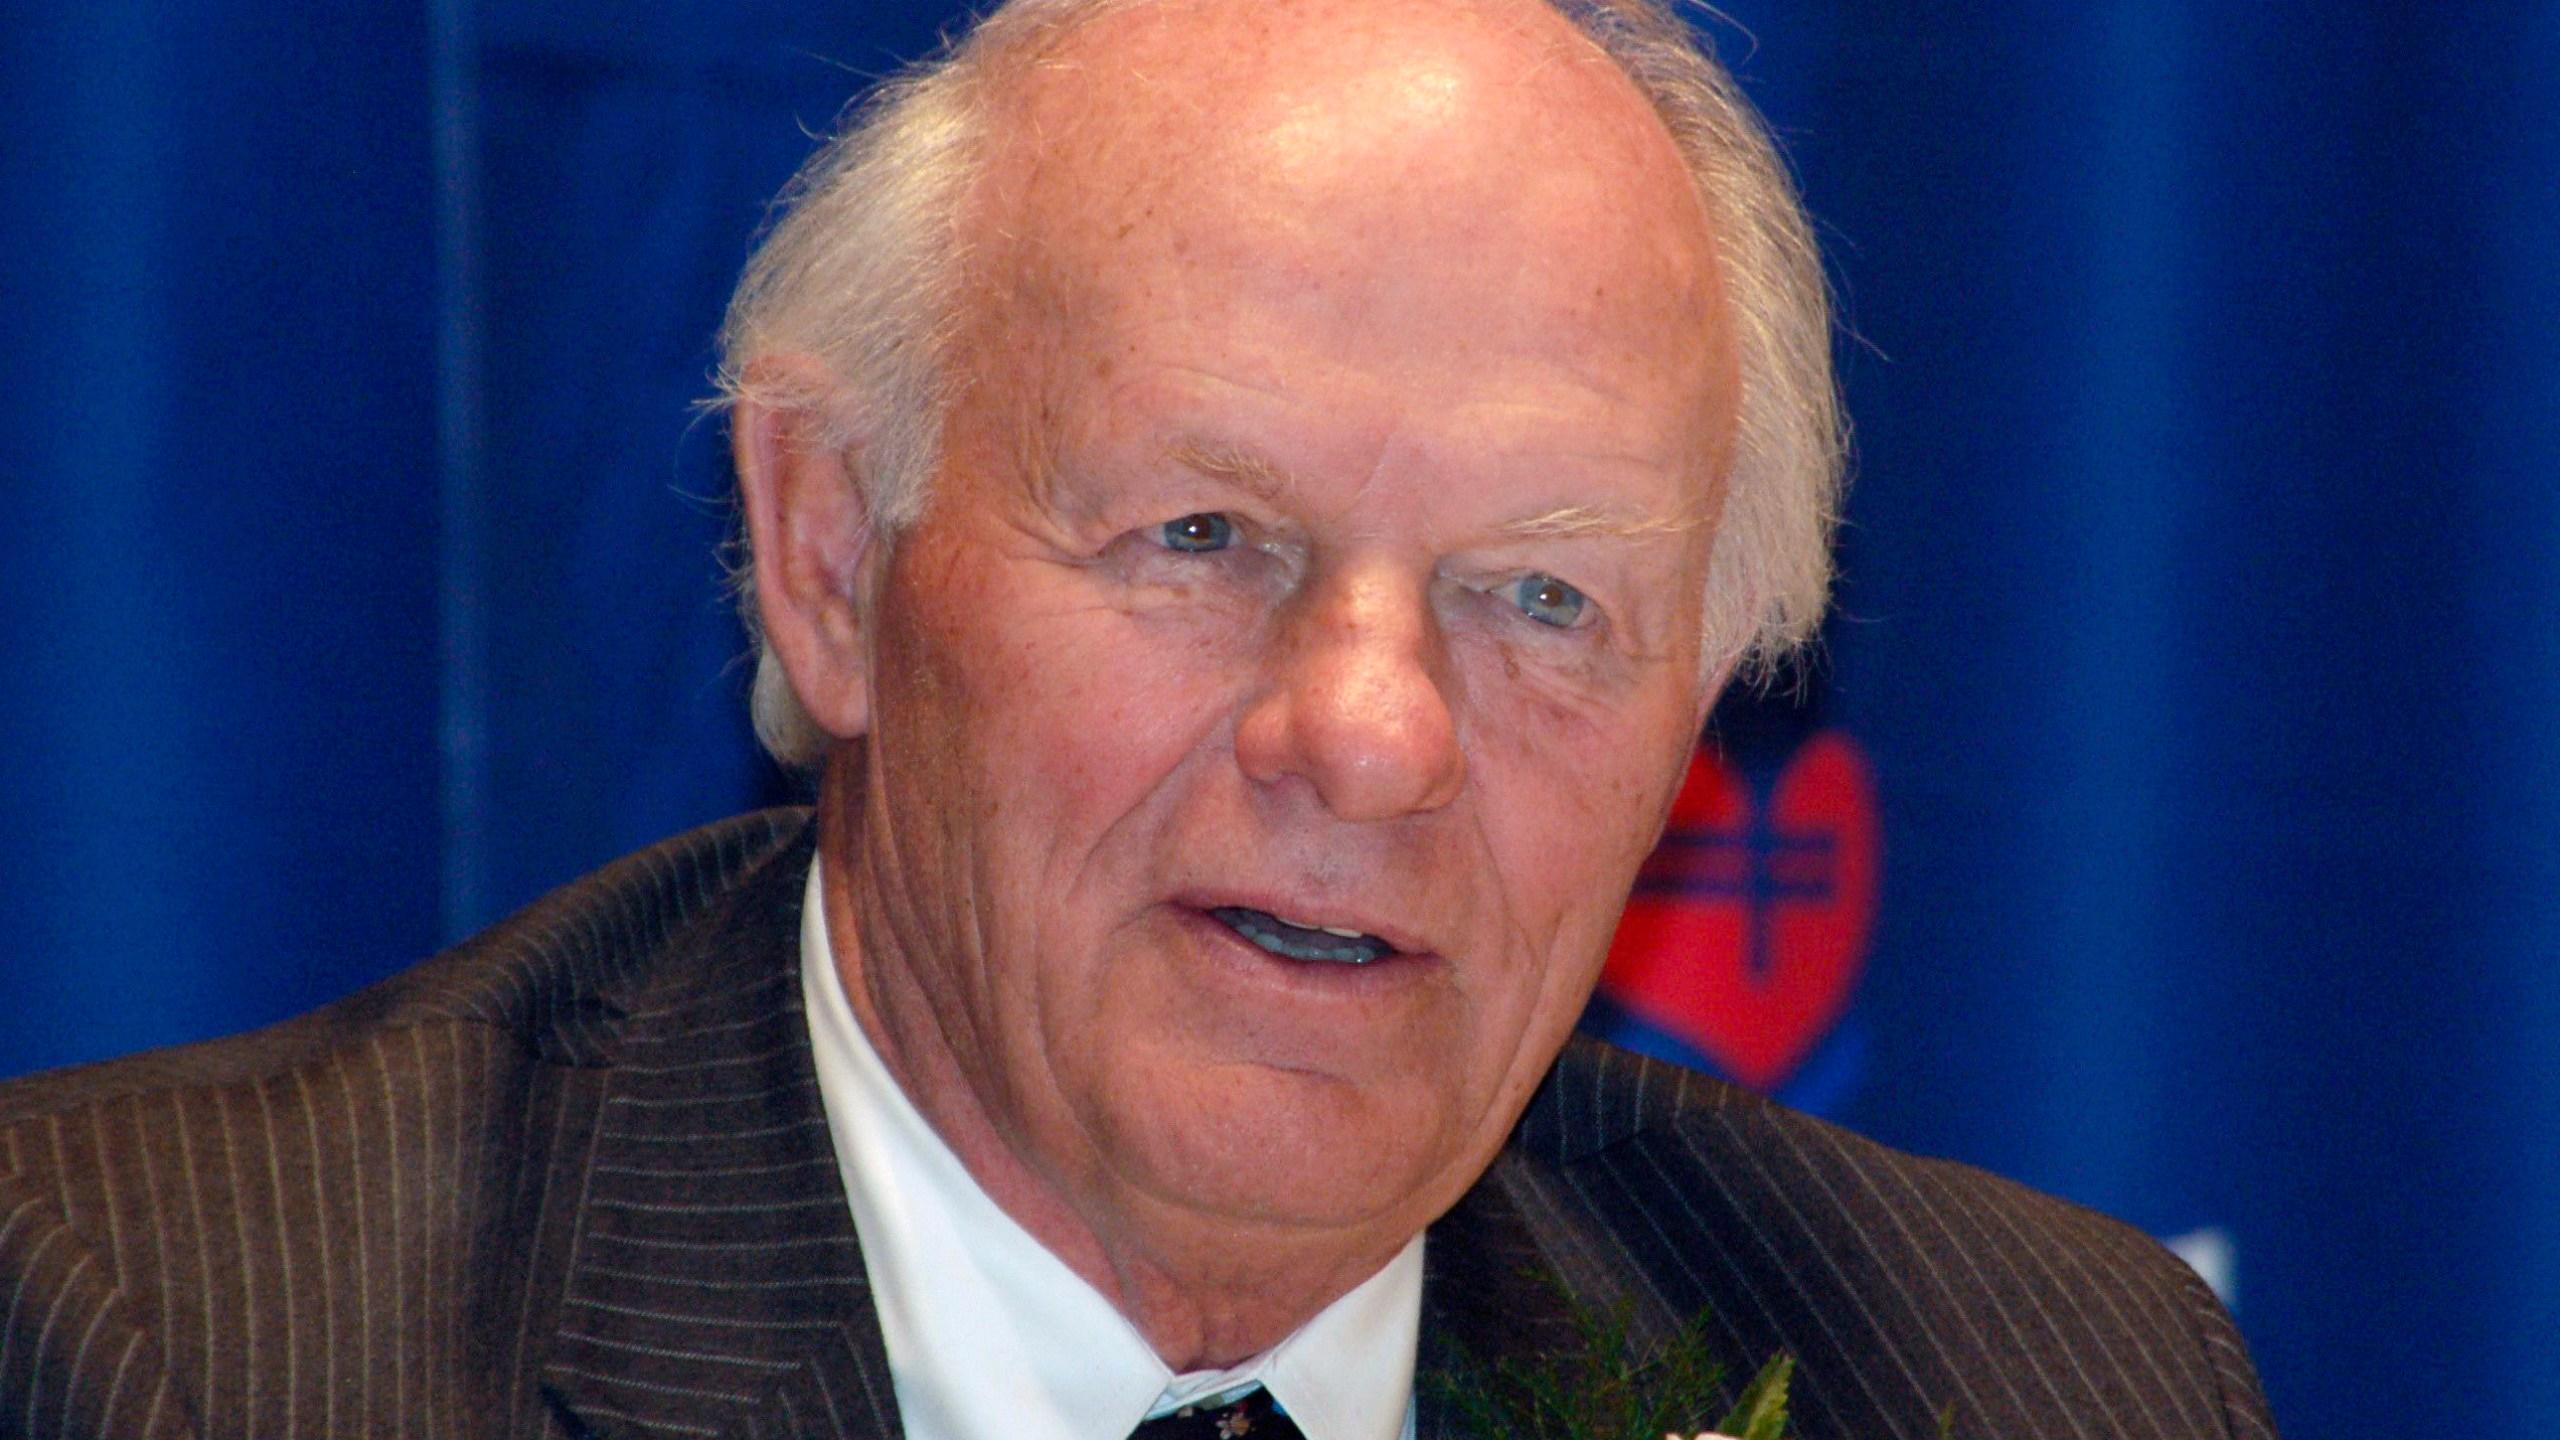 T. Denny Sanford